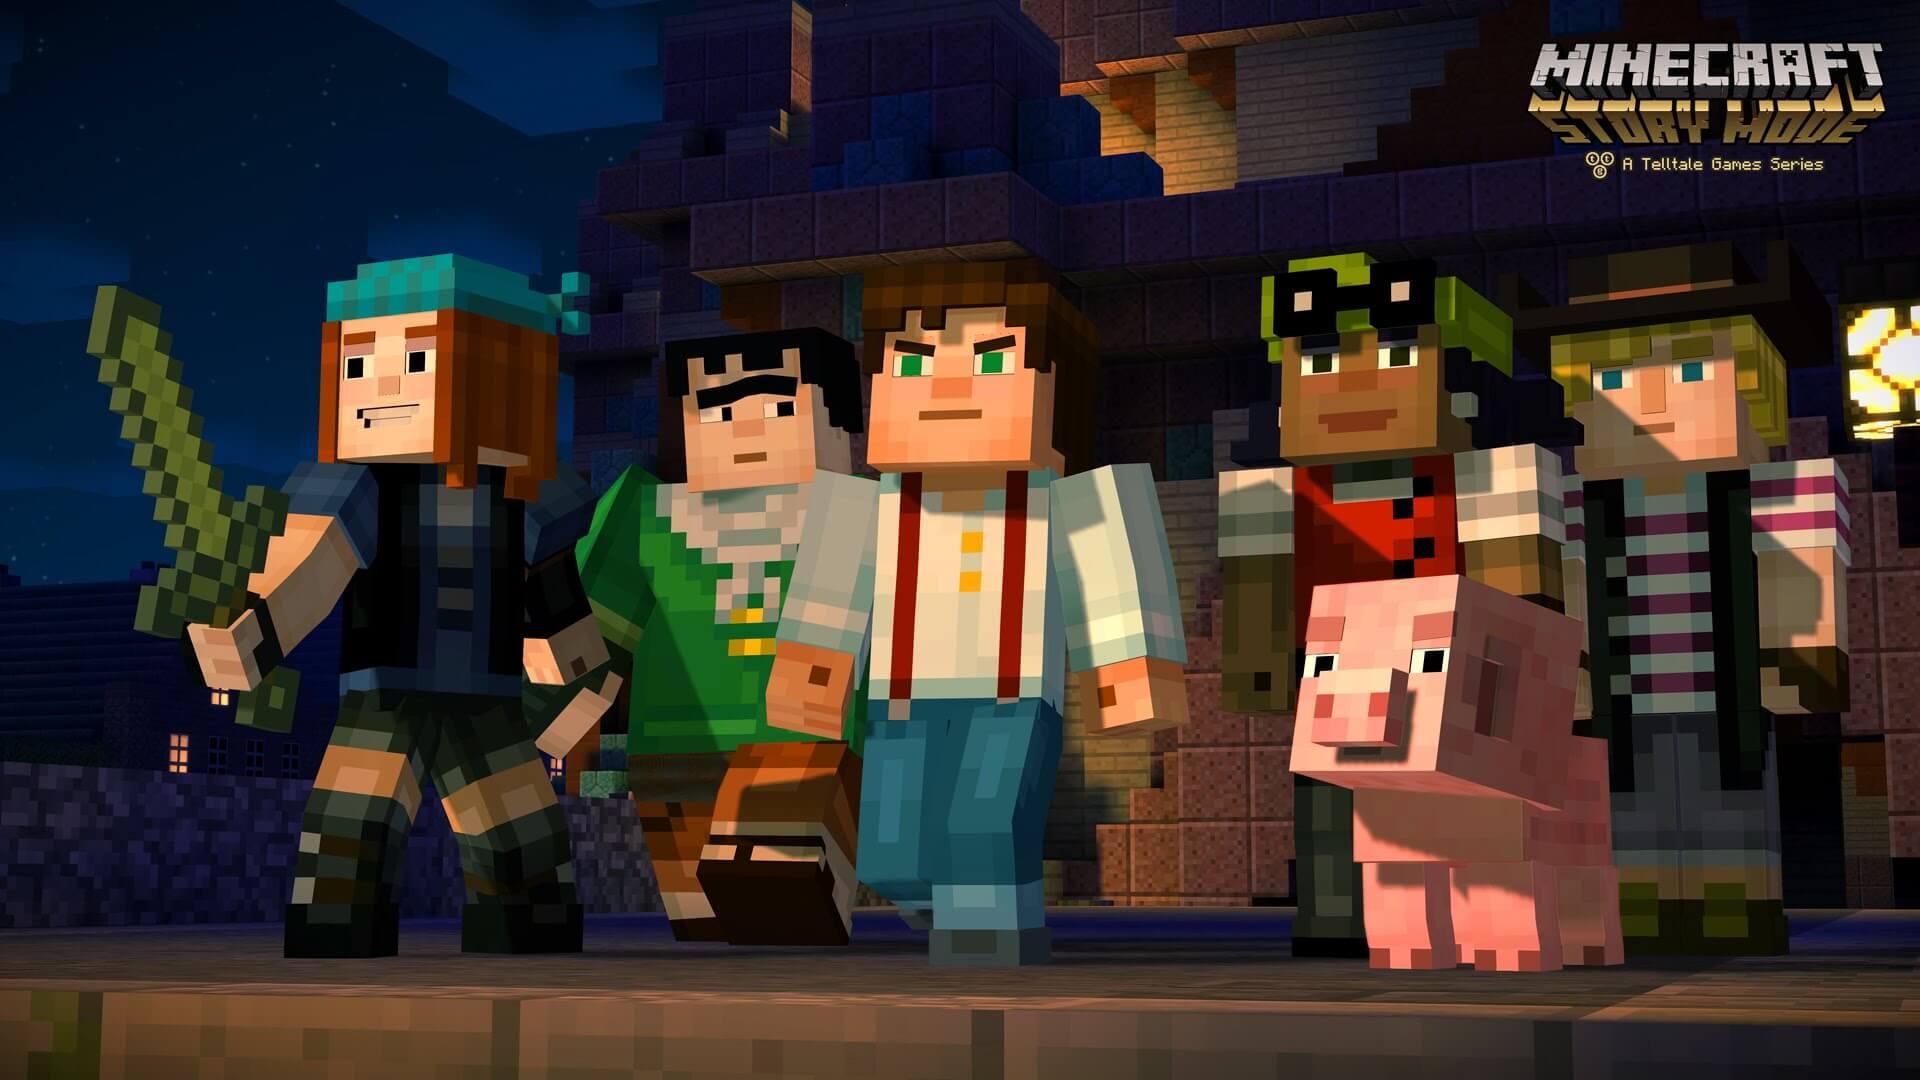 Minecraft Story Mode Episode 1 Full İndir (PC – Minecraft Hikaye Modu)